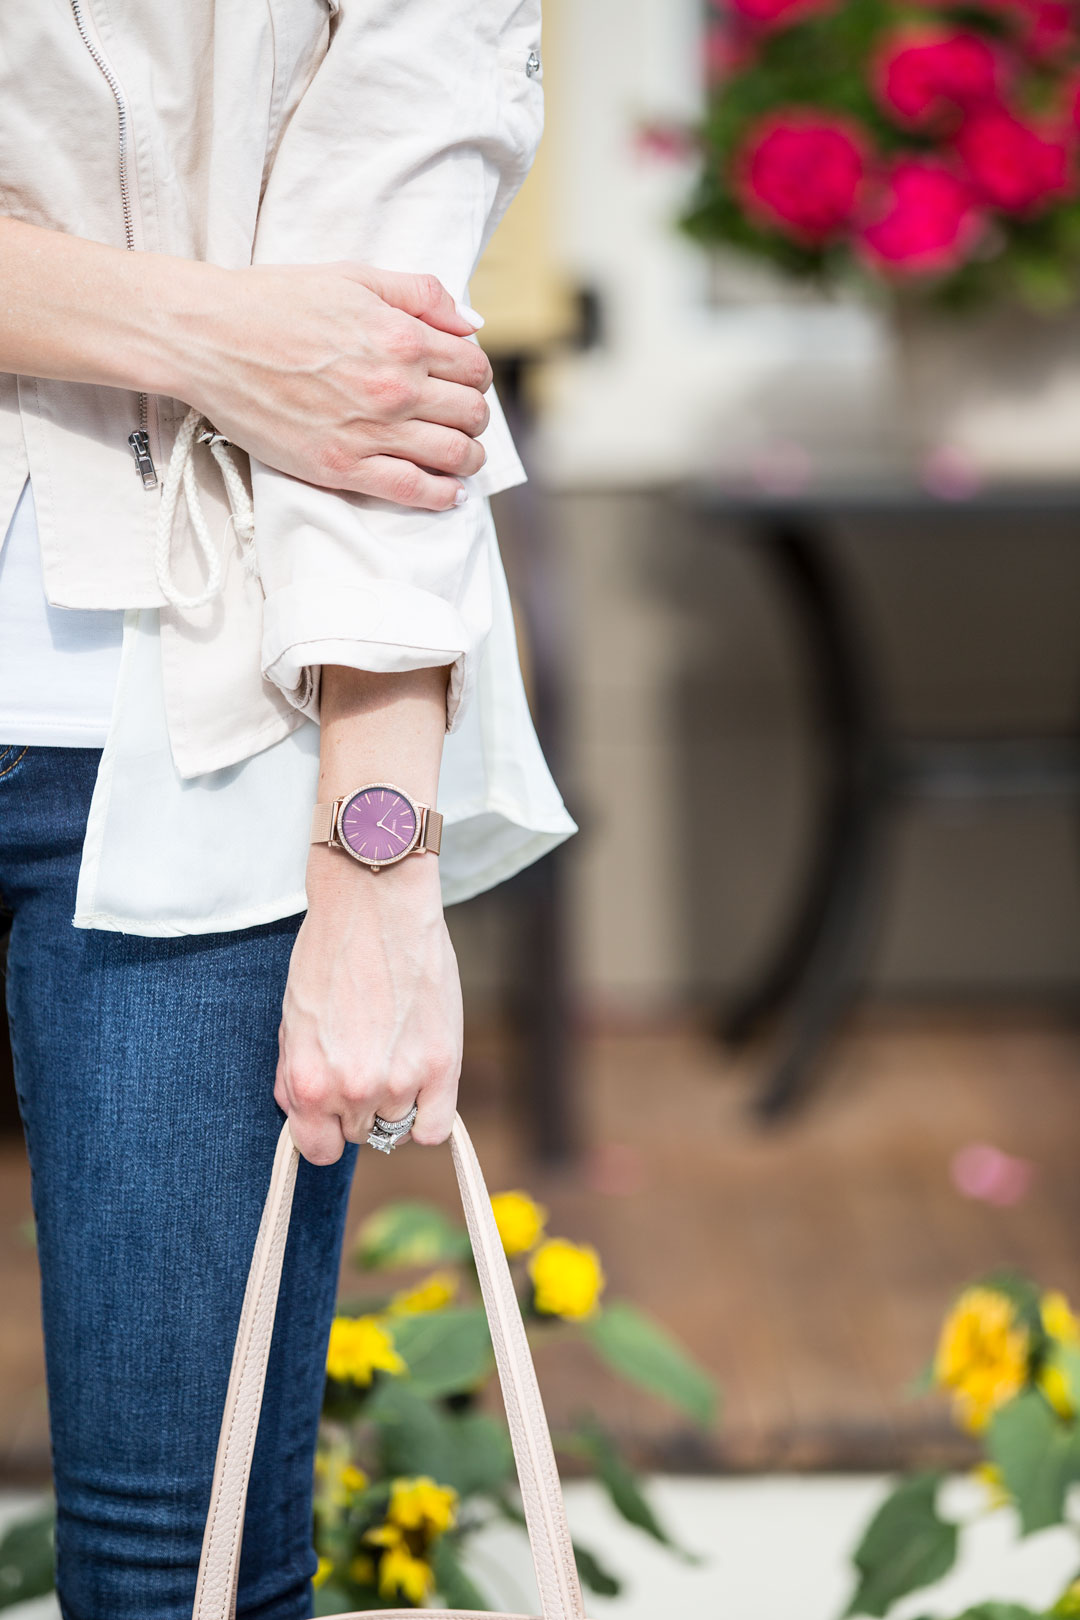 pink timex watch with rhinestones